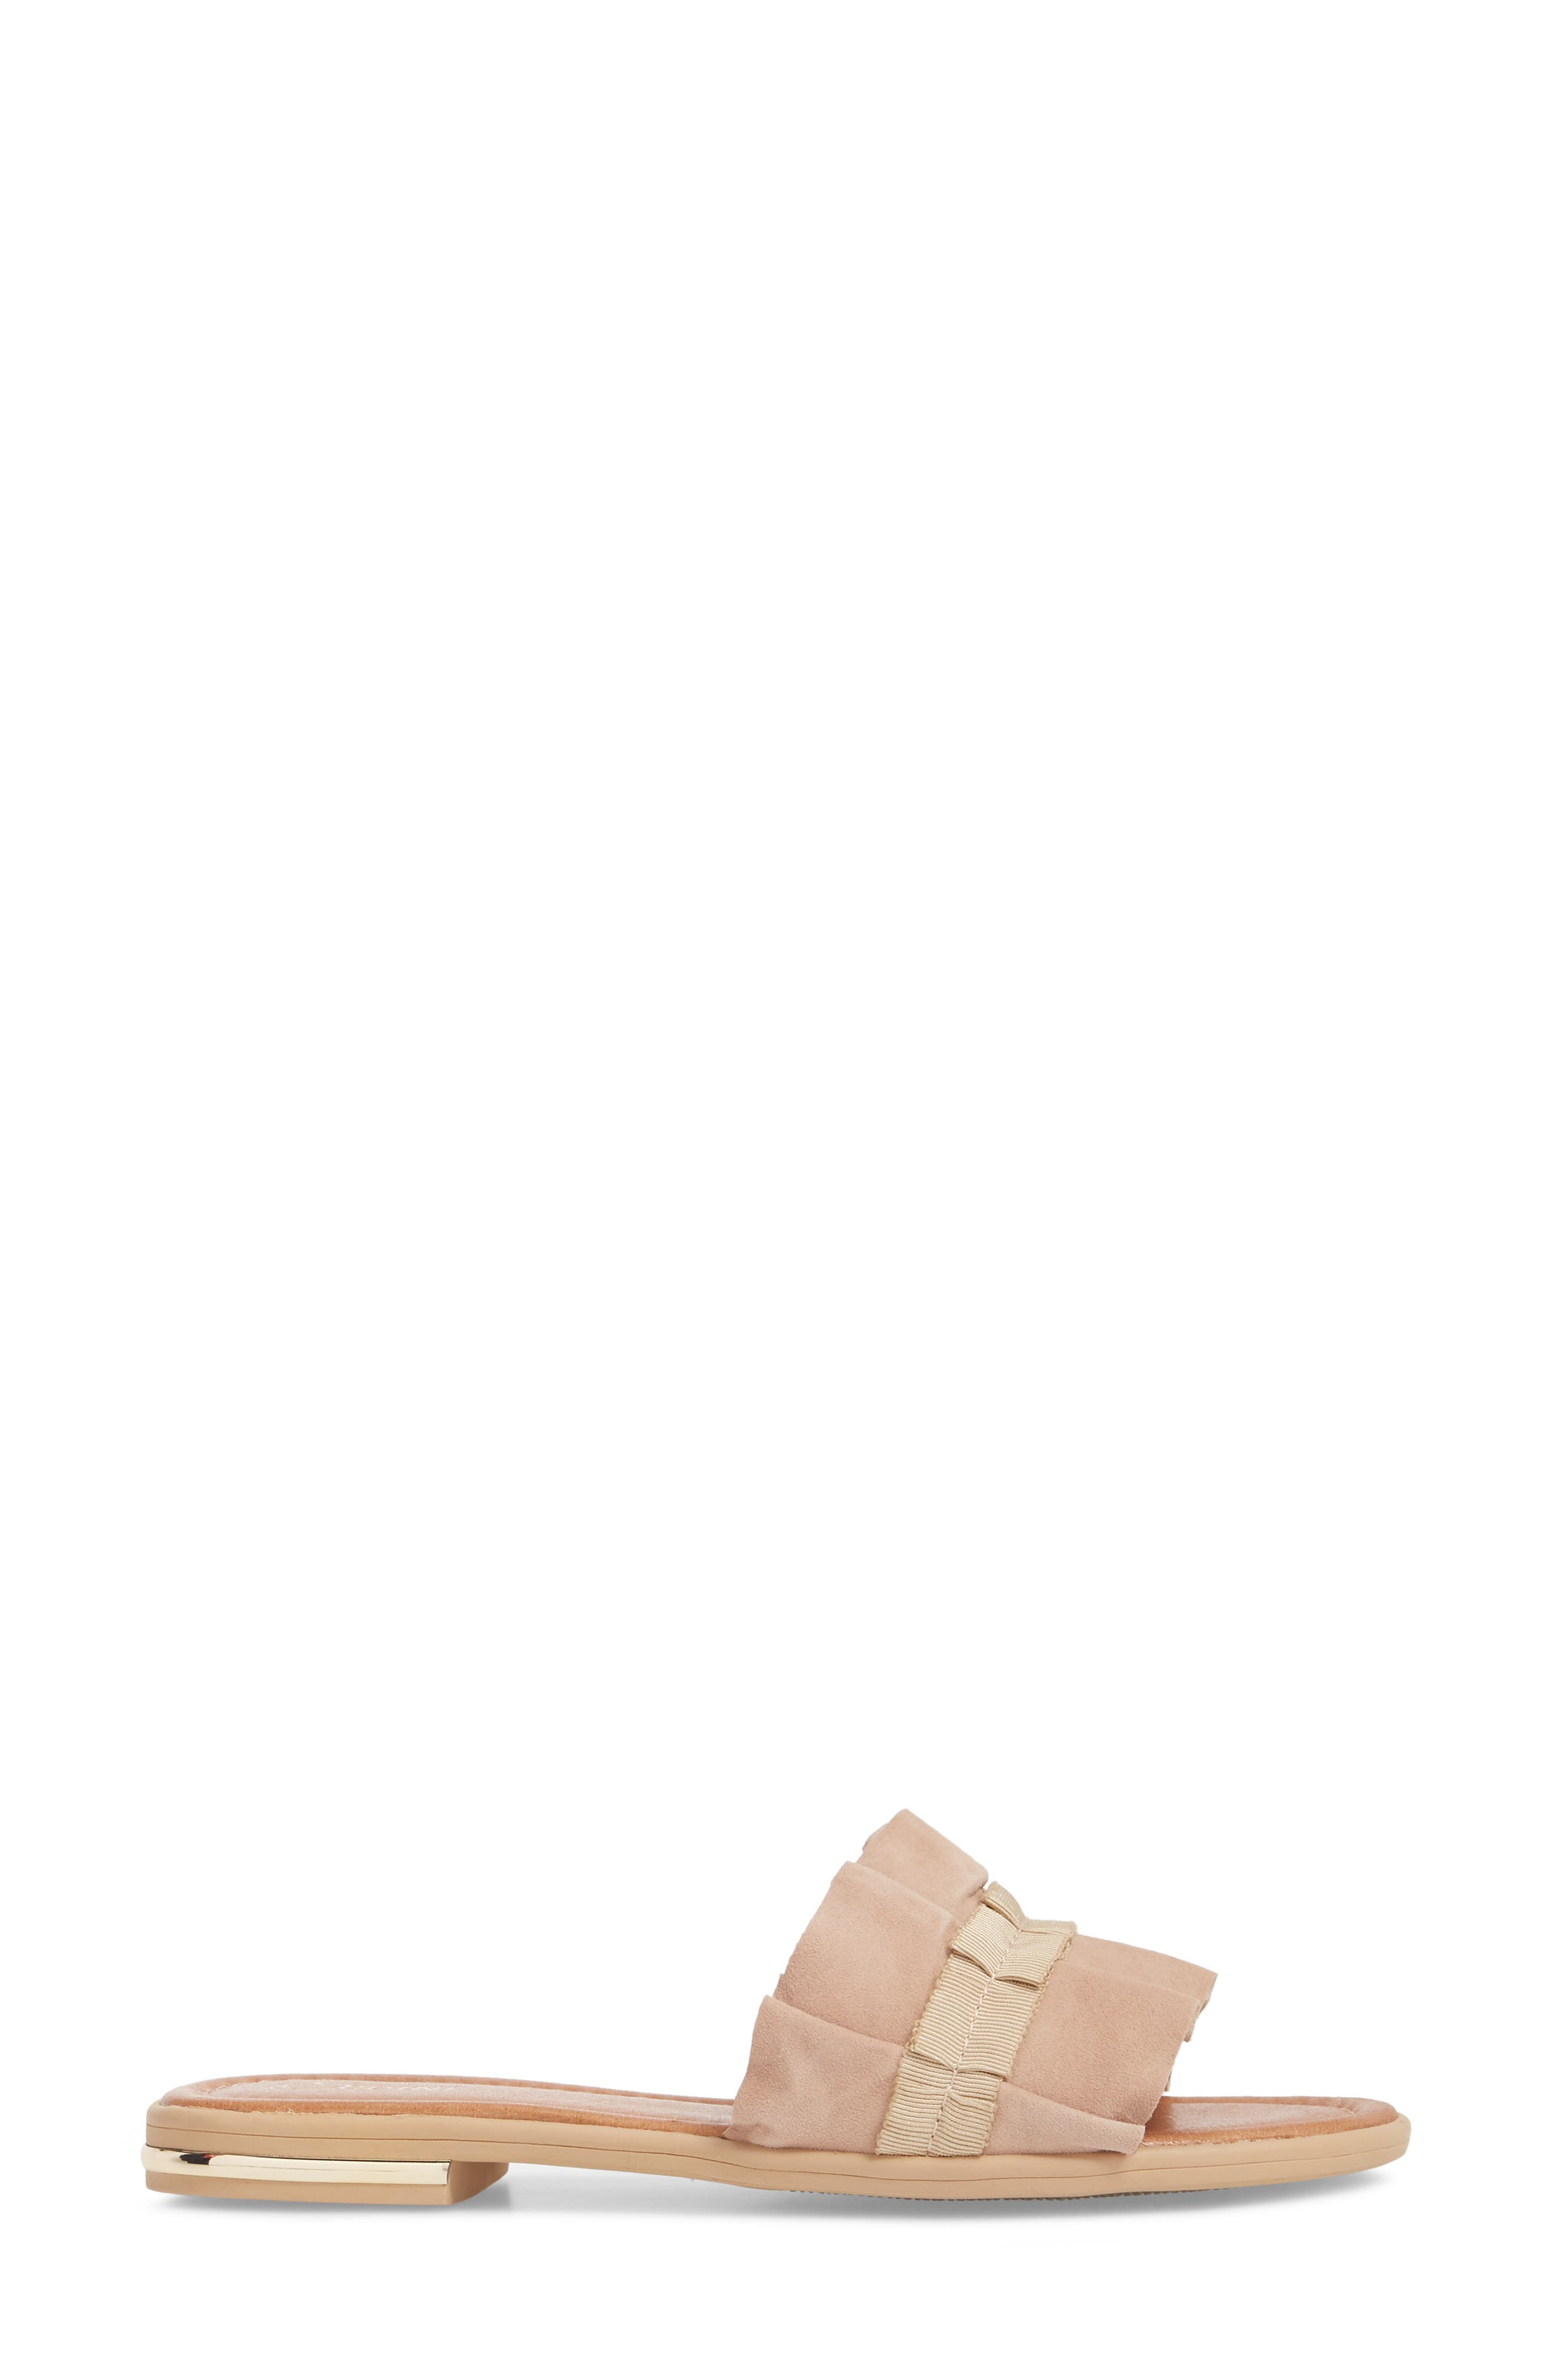 Ravenna Slide Sandal,                             Alternate thumbnail 3, color,                             NUDE SUEDE